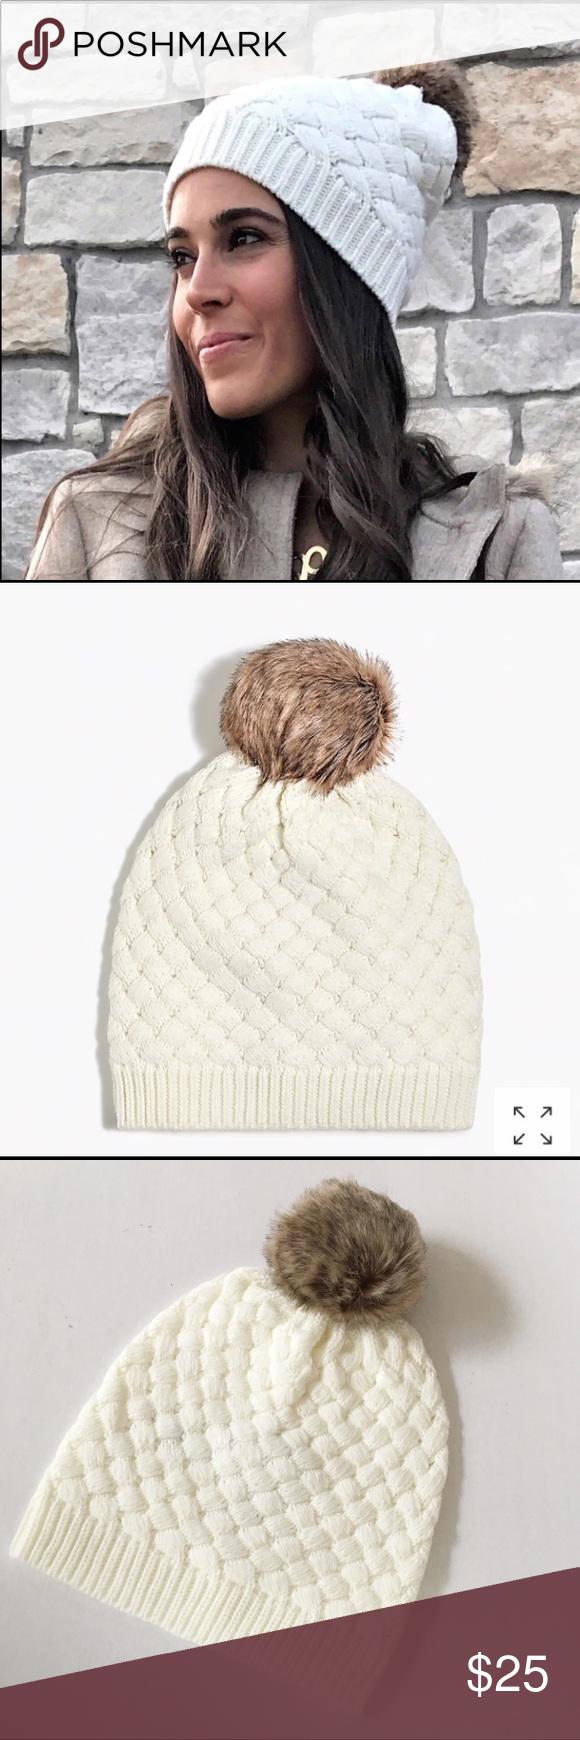 48c4c03b9d917 NEW J Crew Factory knit faux fur Pom Pom hat New with tag. J Crew ...